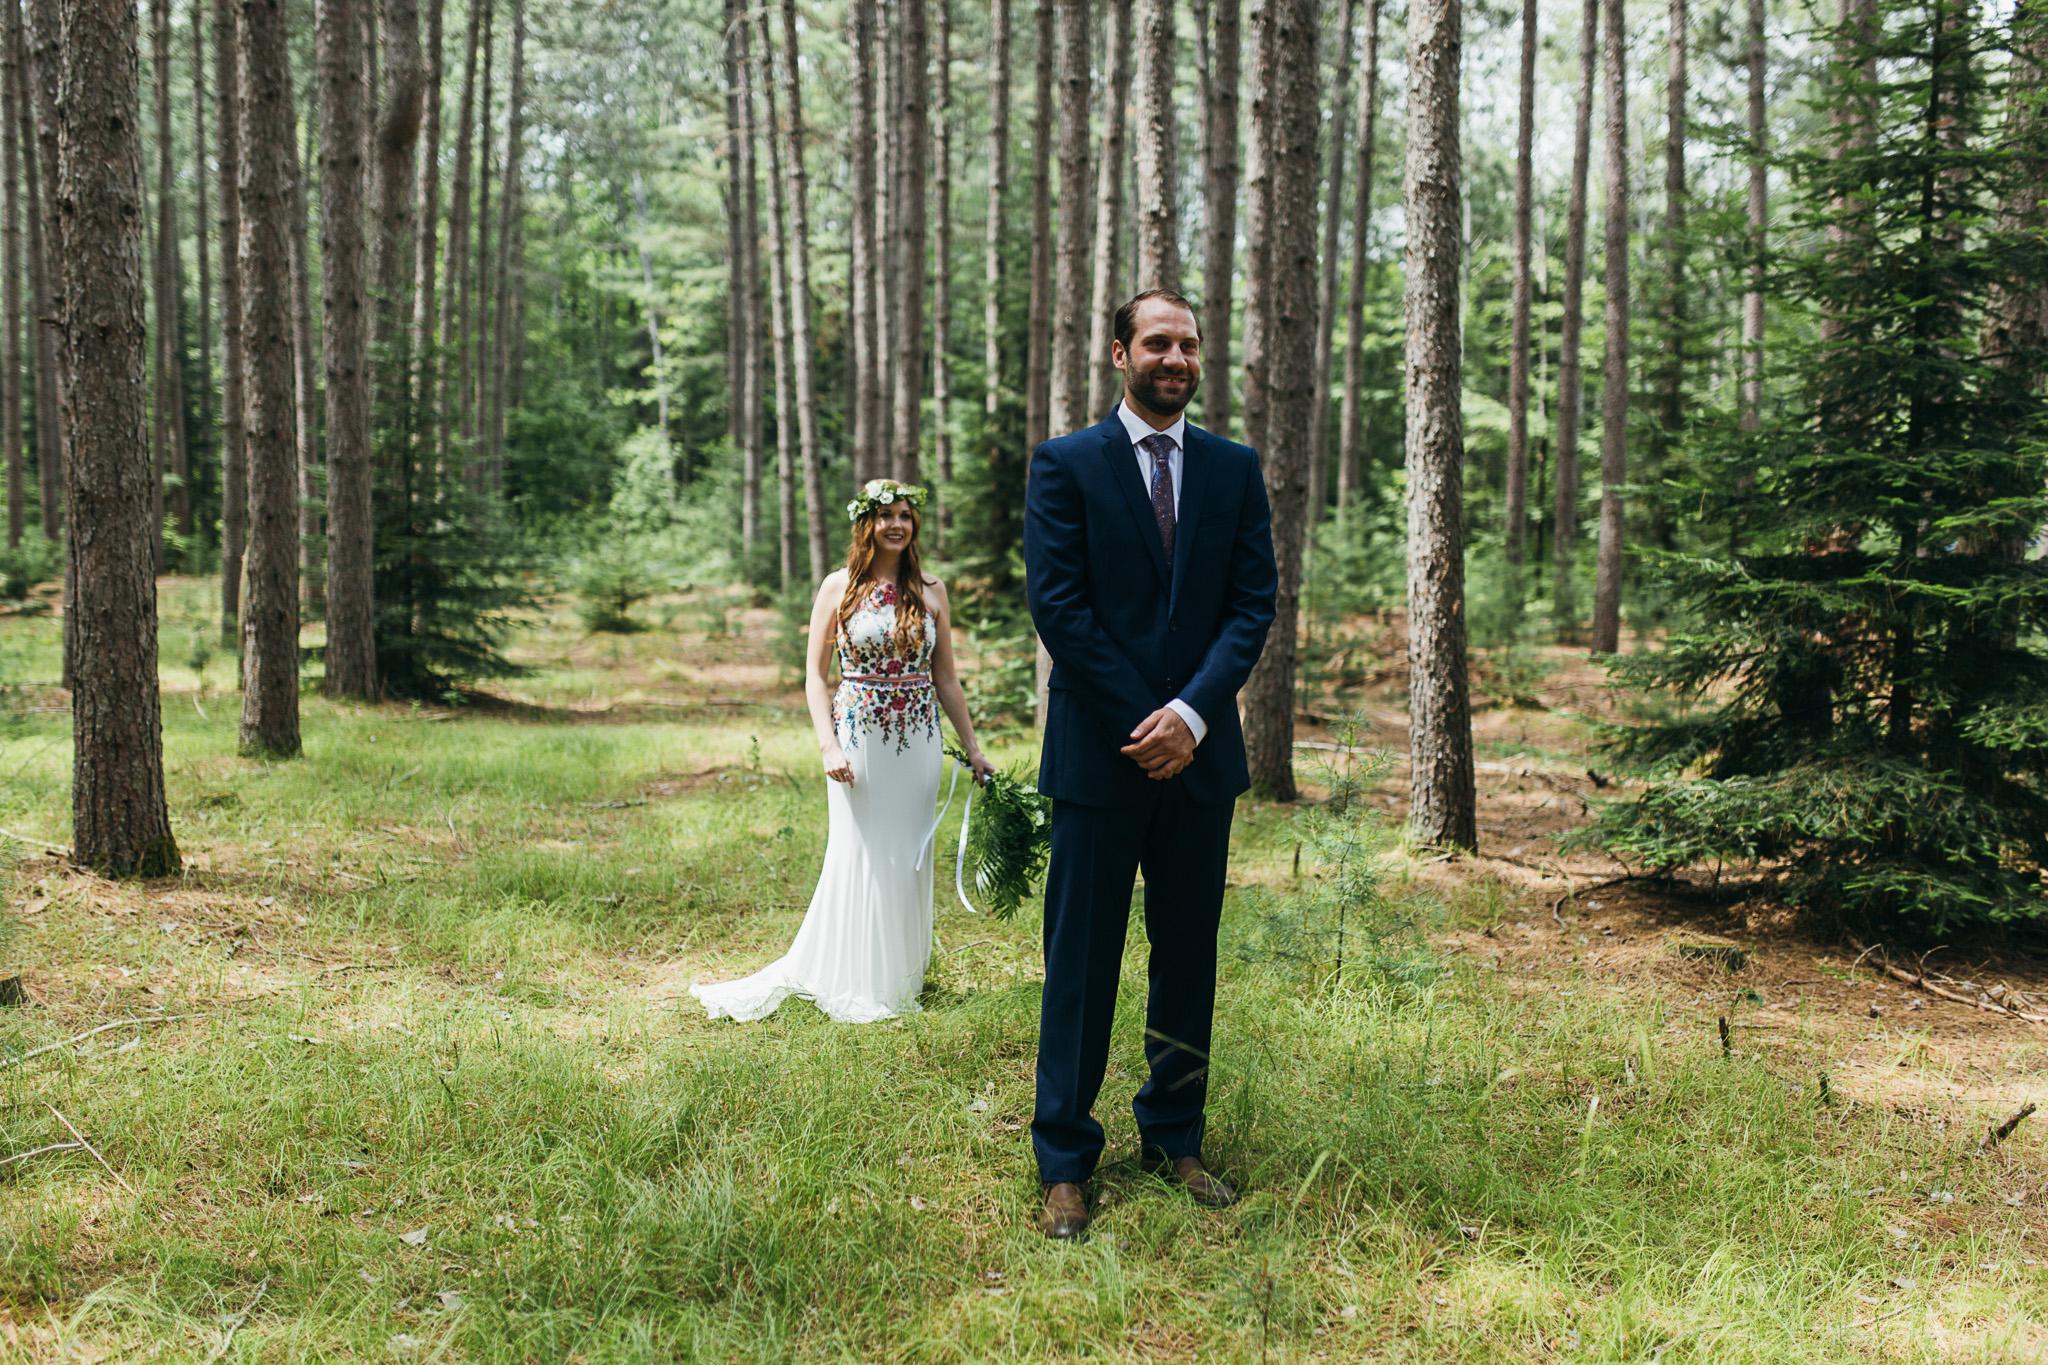 Intimate Backyard Wedding in Bancroft (12 of 143).jpg